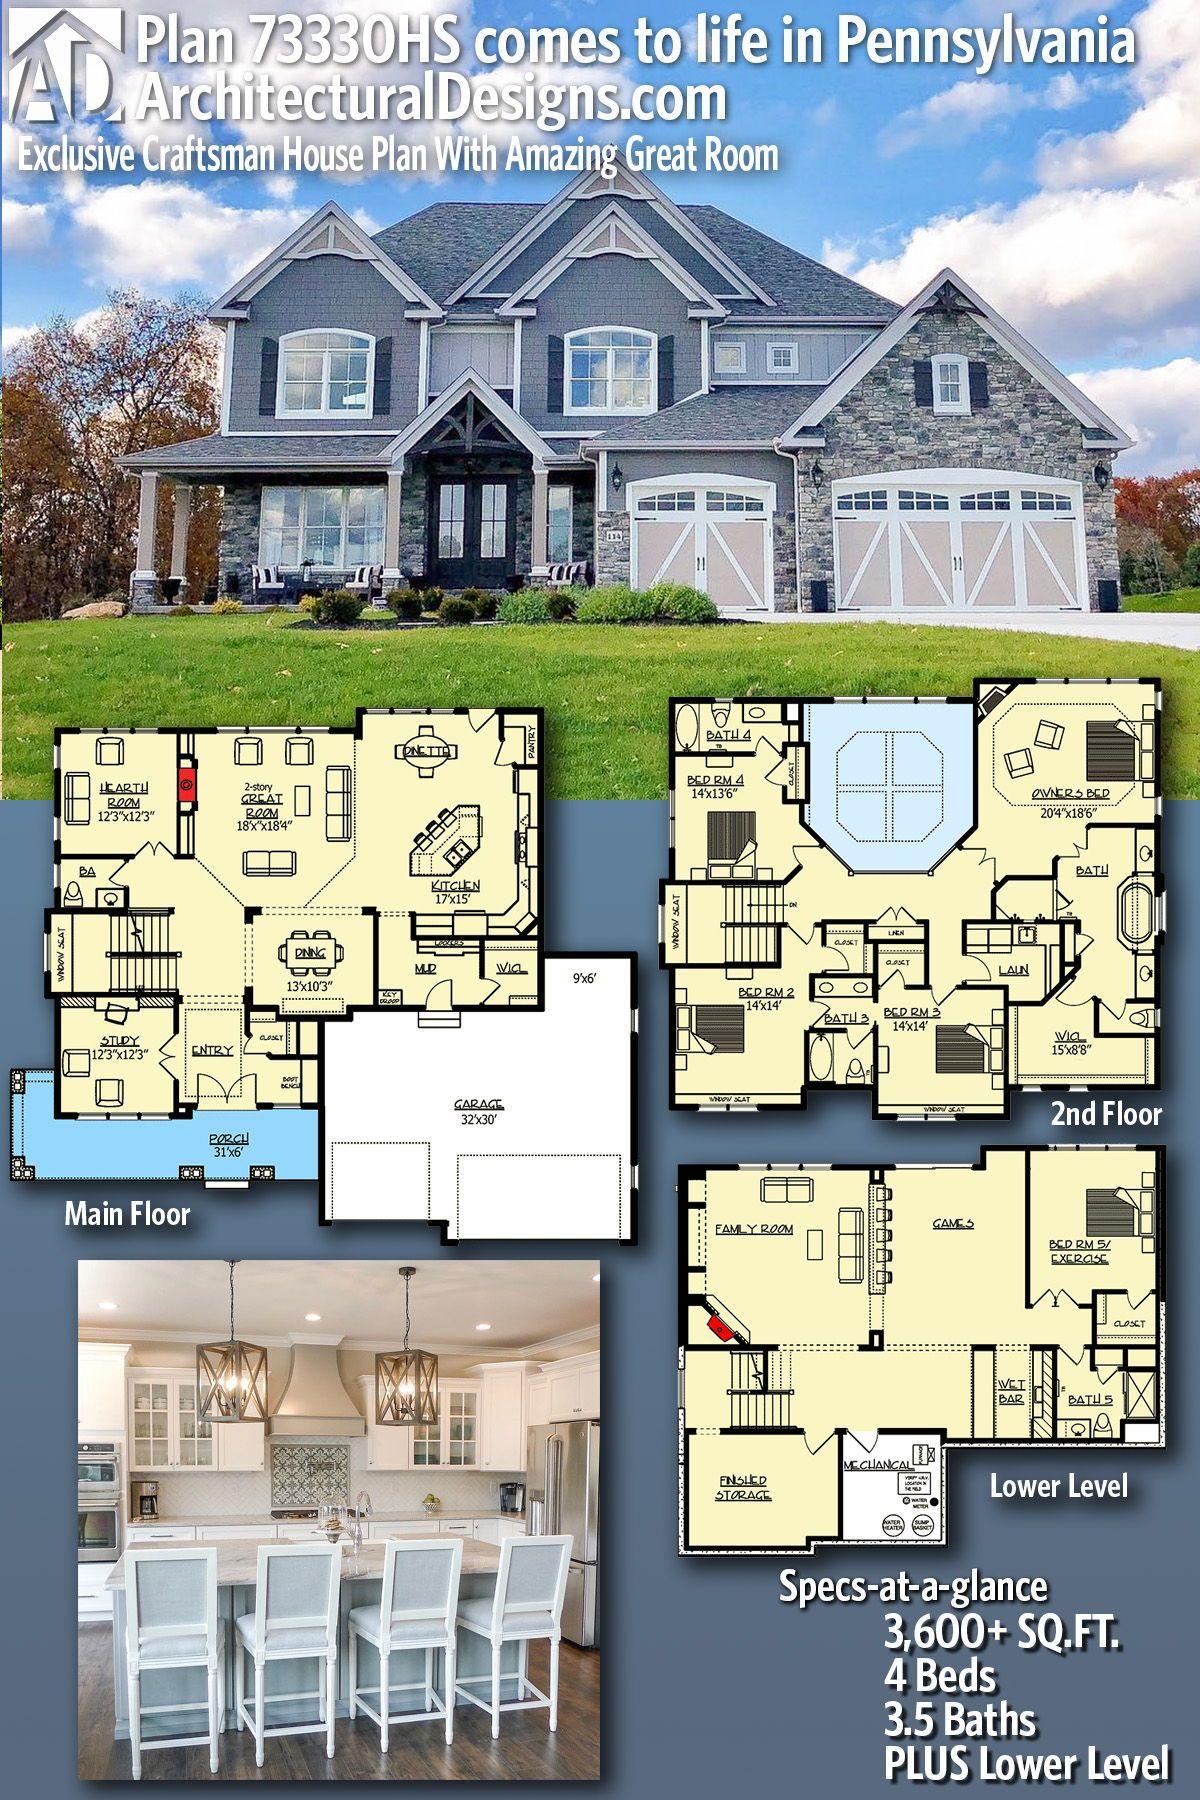 Plan 73330hs Exclusive Craftsman House Plan With Amazing Great Room Exclusive House Plan House Plans Craftsman House Plan